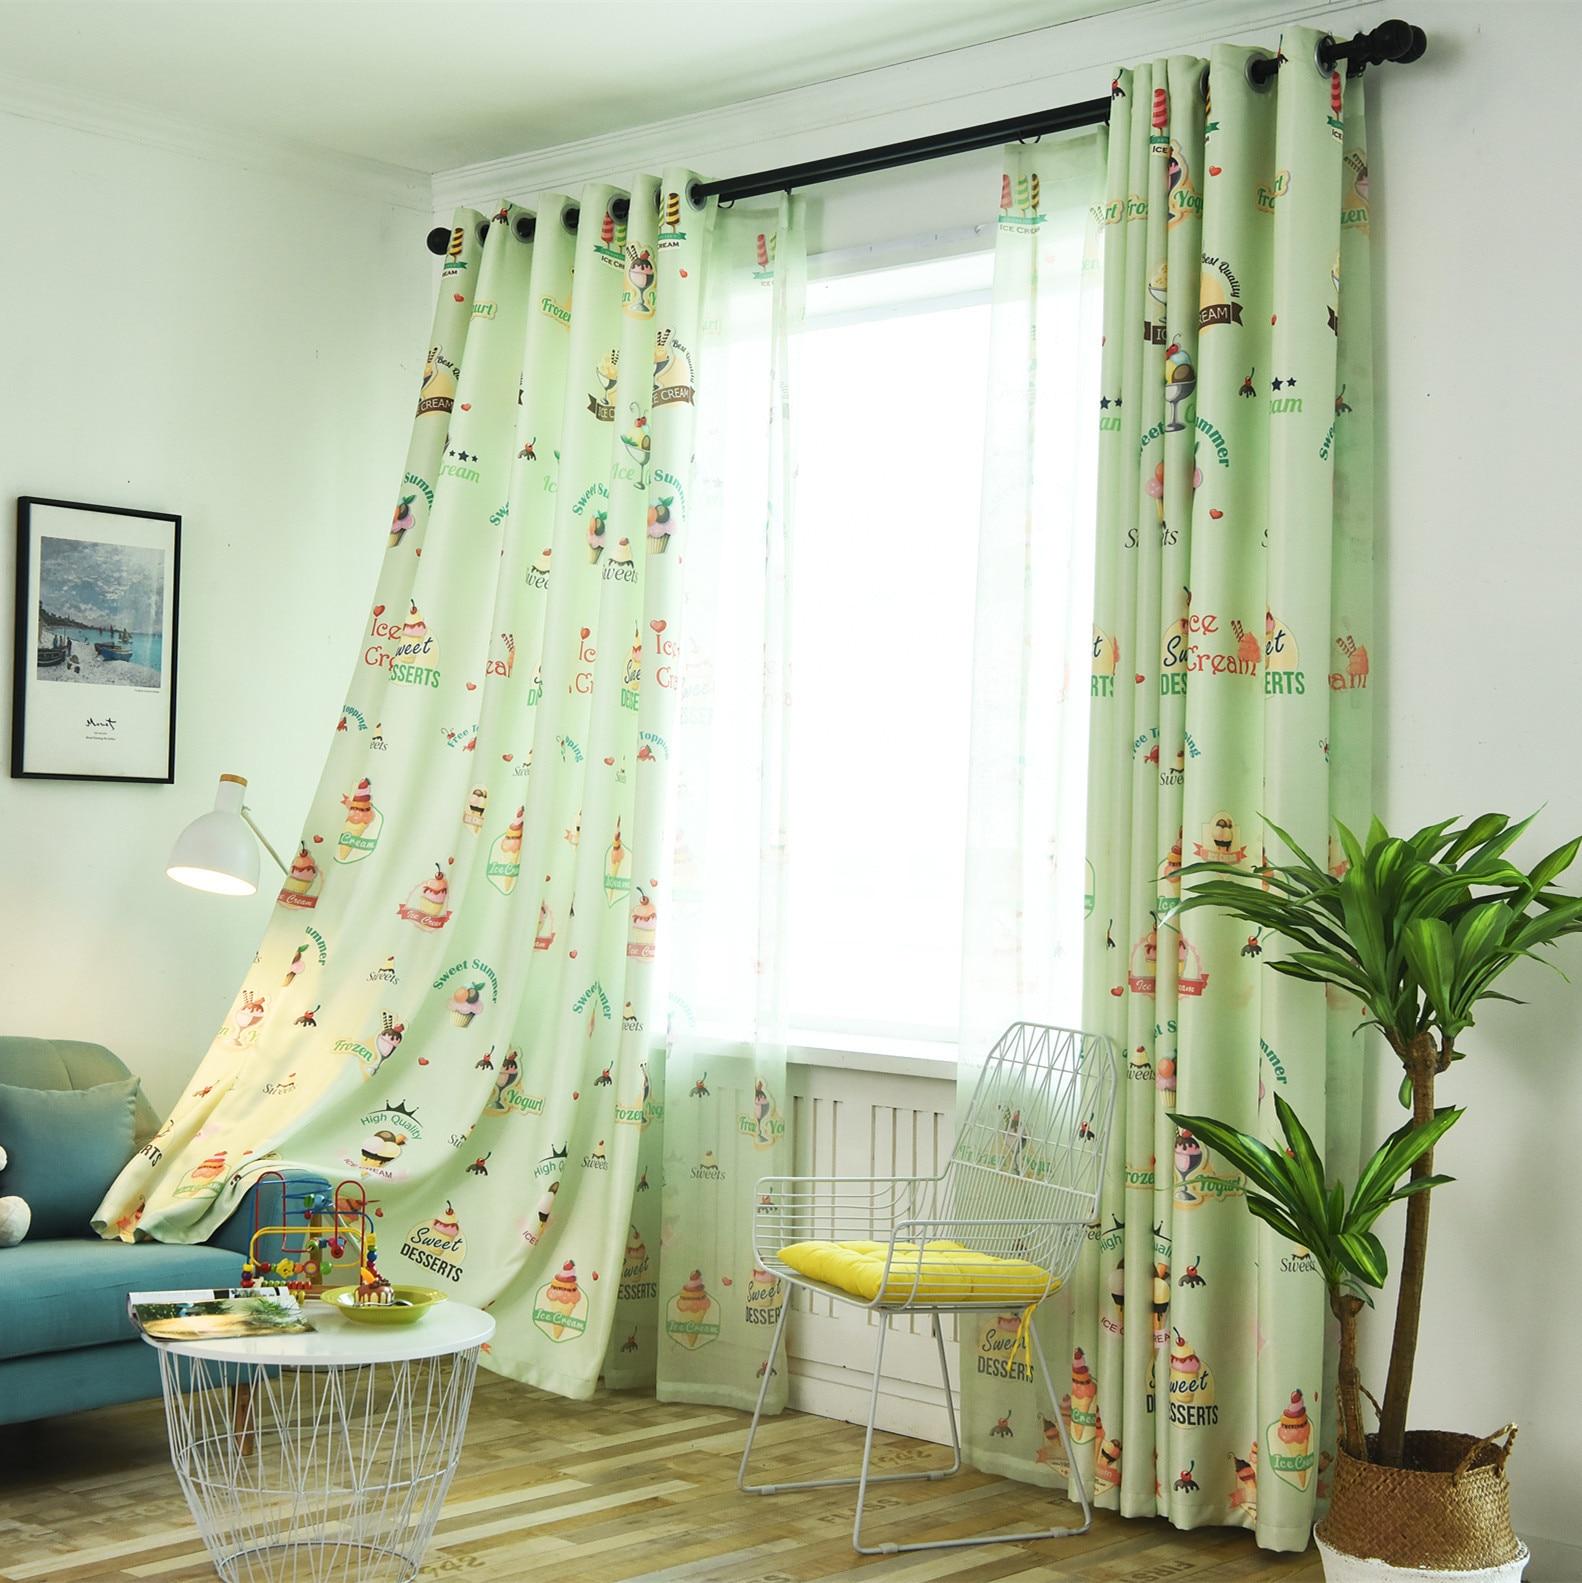 Apartment Living For The Modern Minimalist: Aliexpress.com : Buy Modern Minimalist Japanese Curtains